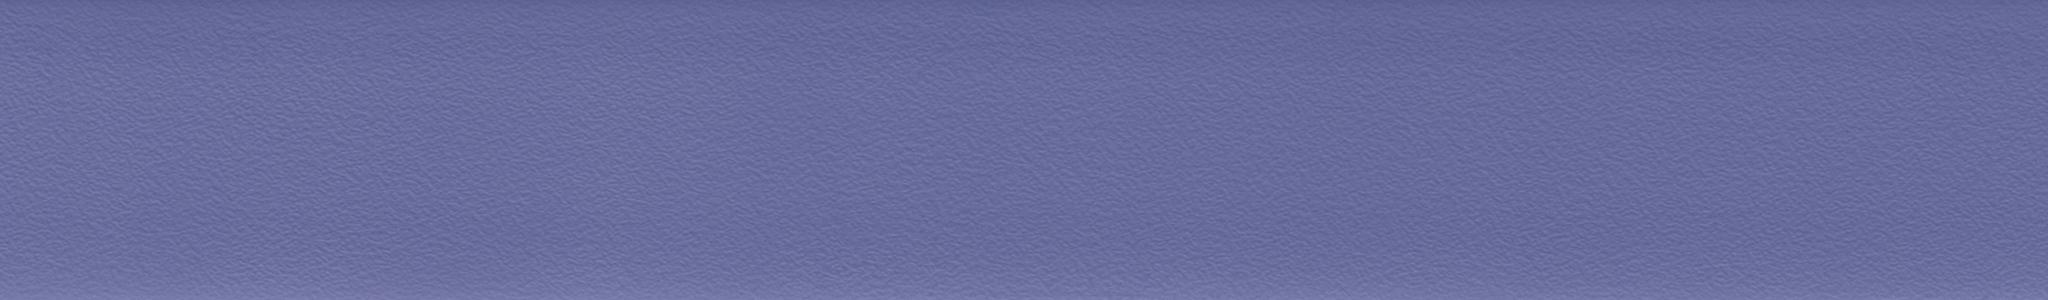 HU 15430 кромка ABS фиолетовая жемчуг XG